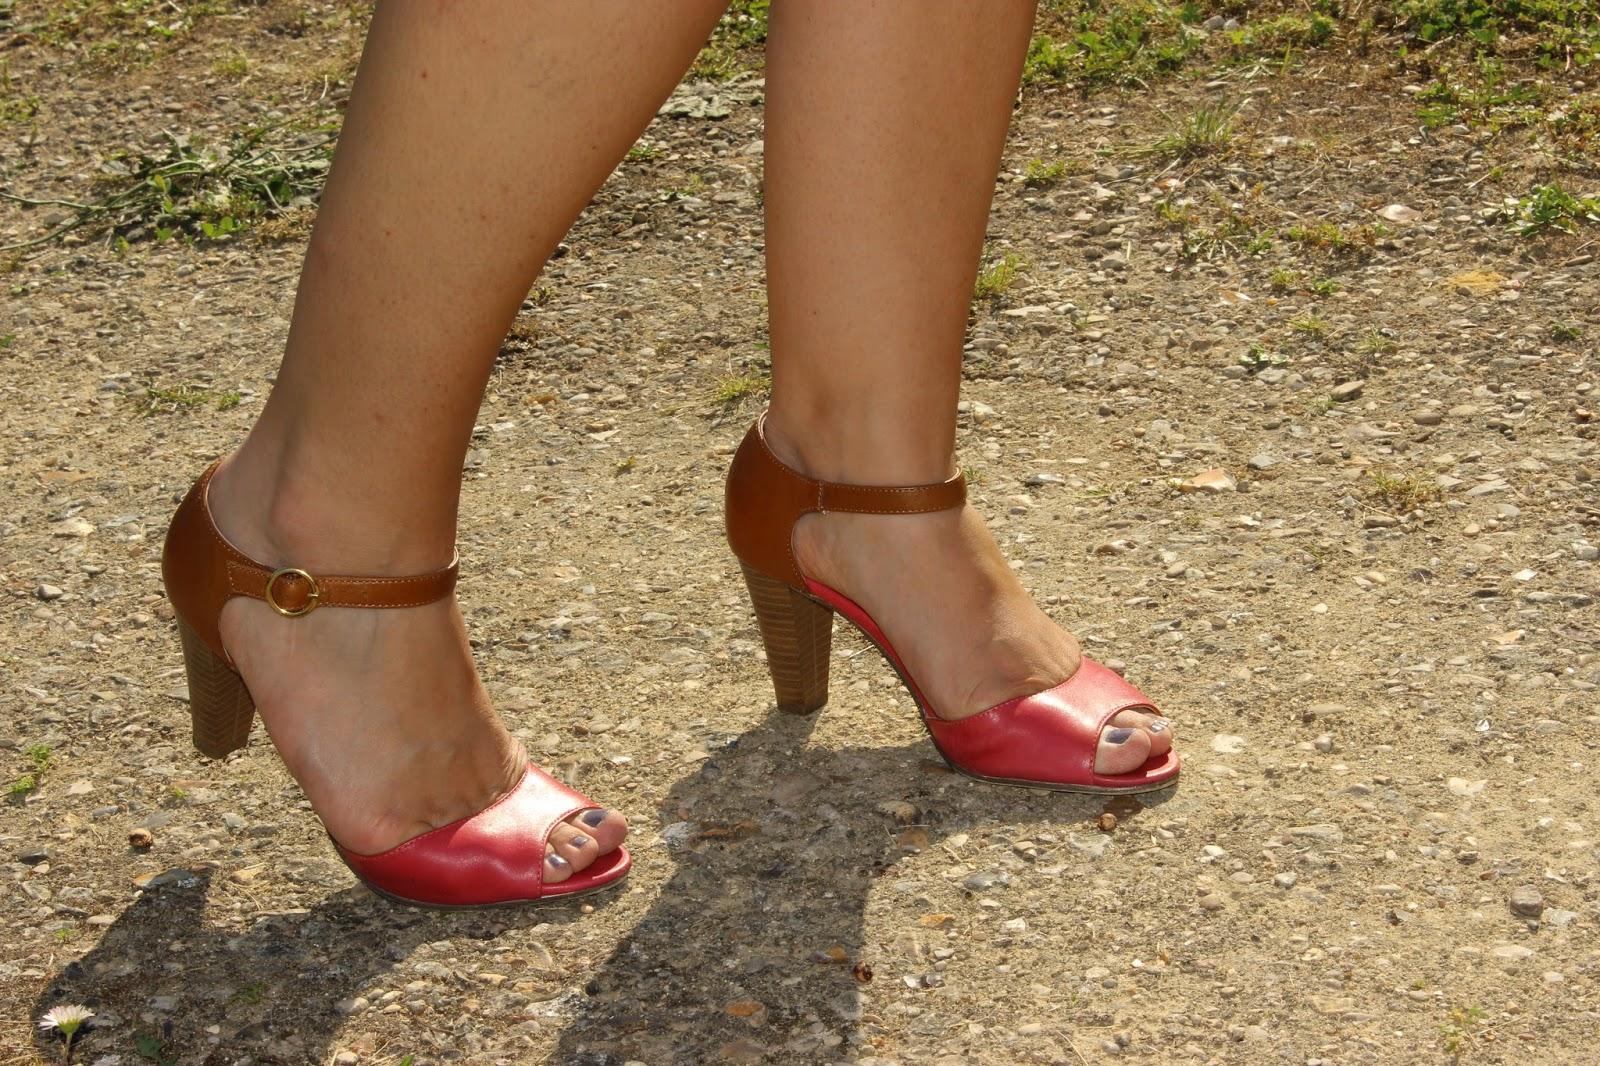 robe nude Naf Naf, chaussures bicolore Naf Naf